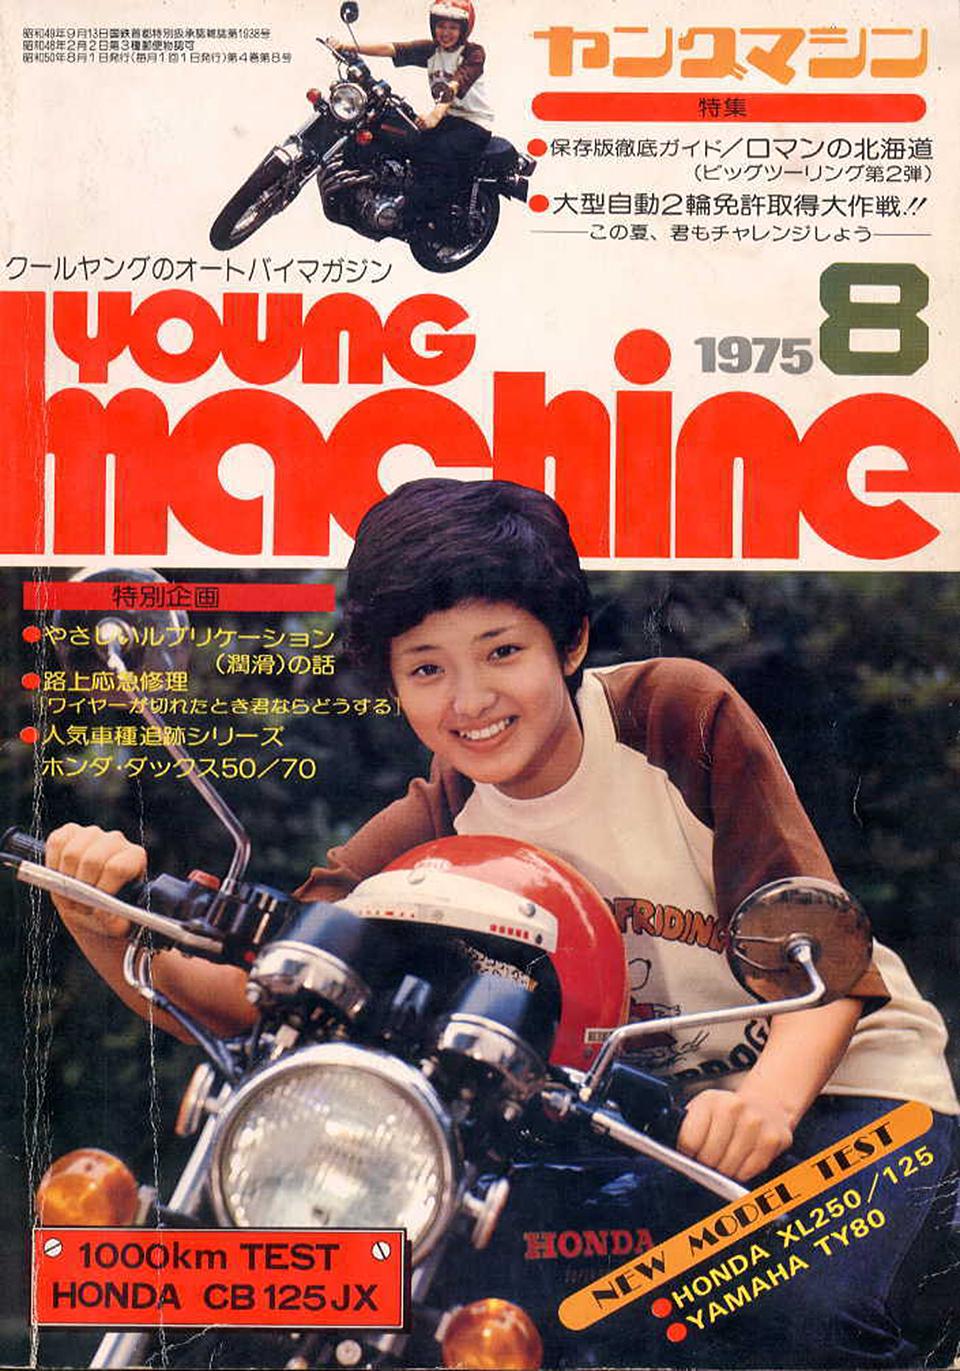 Young-Machine-1975-Honda-CB400F-1975-1